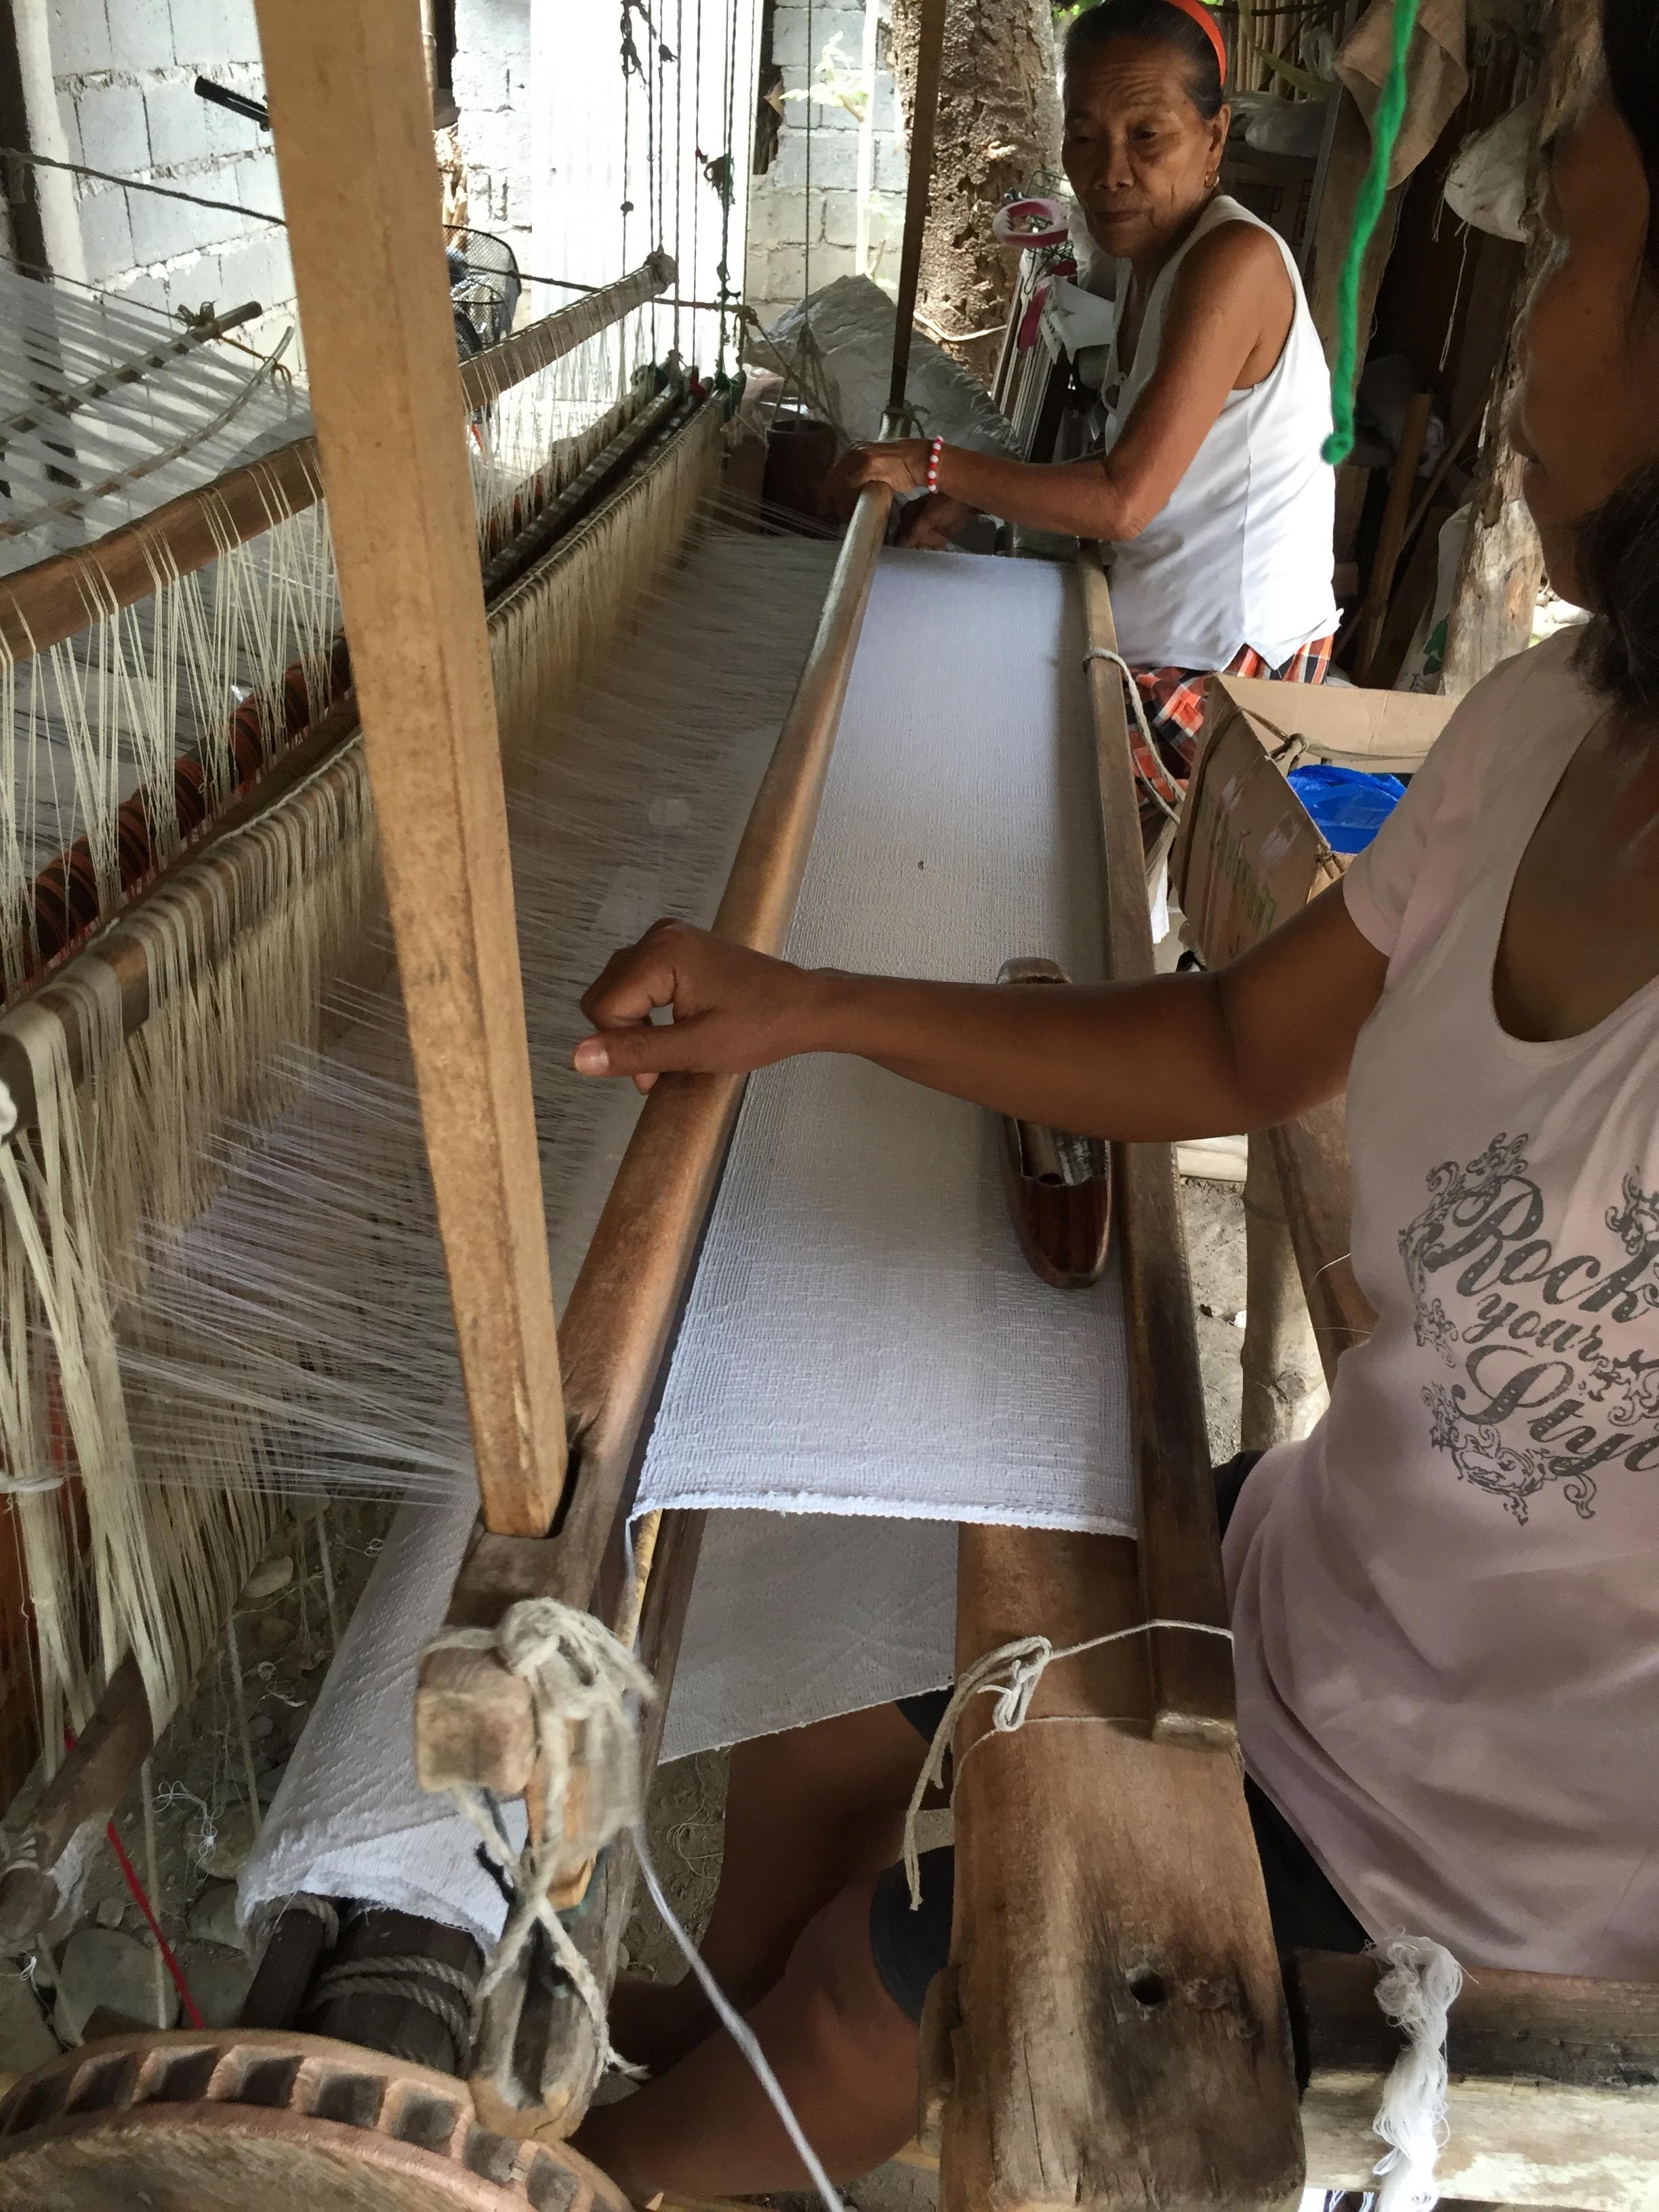 Weavers from La Union can make blankets